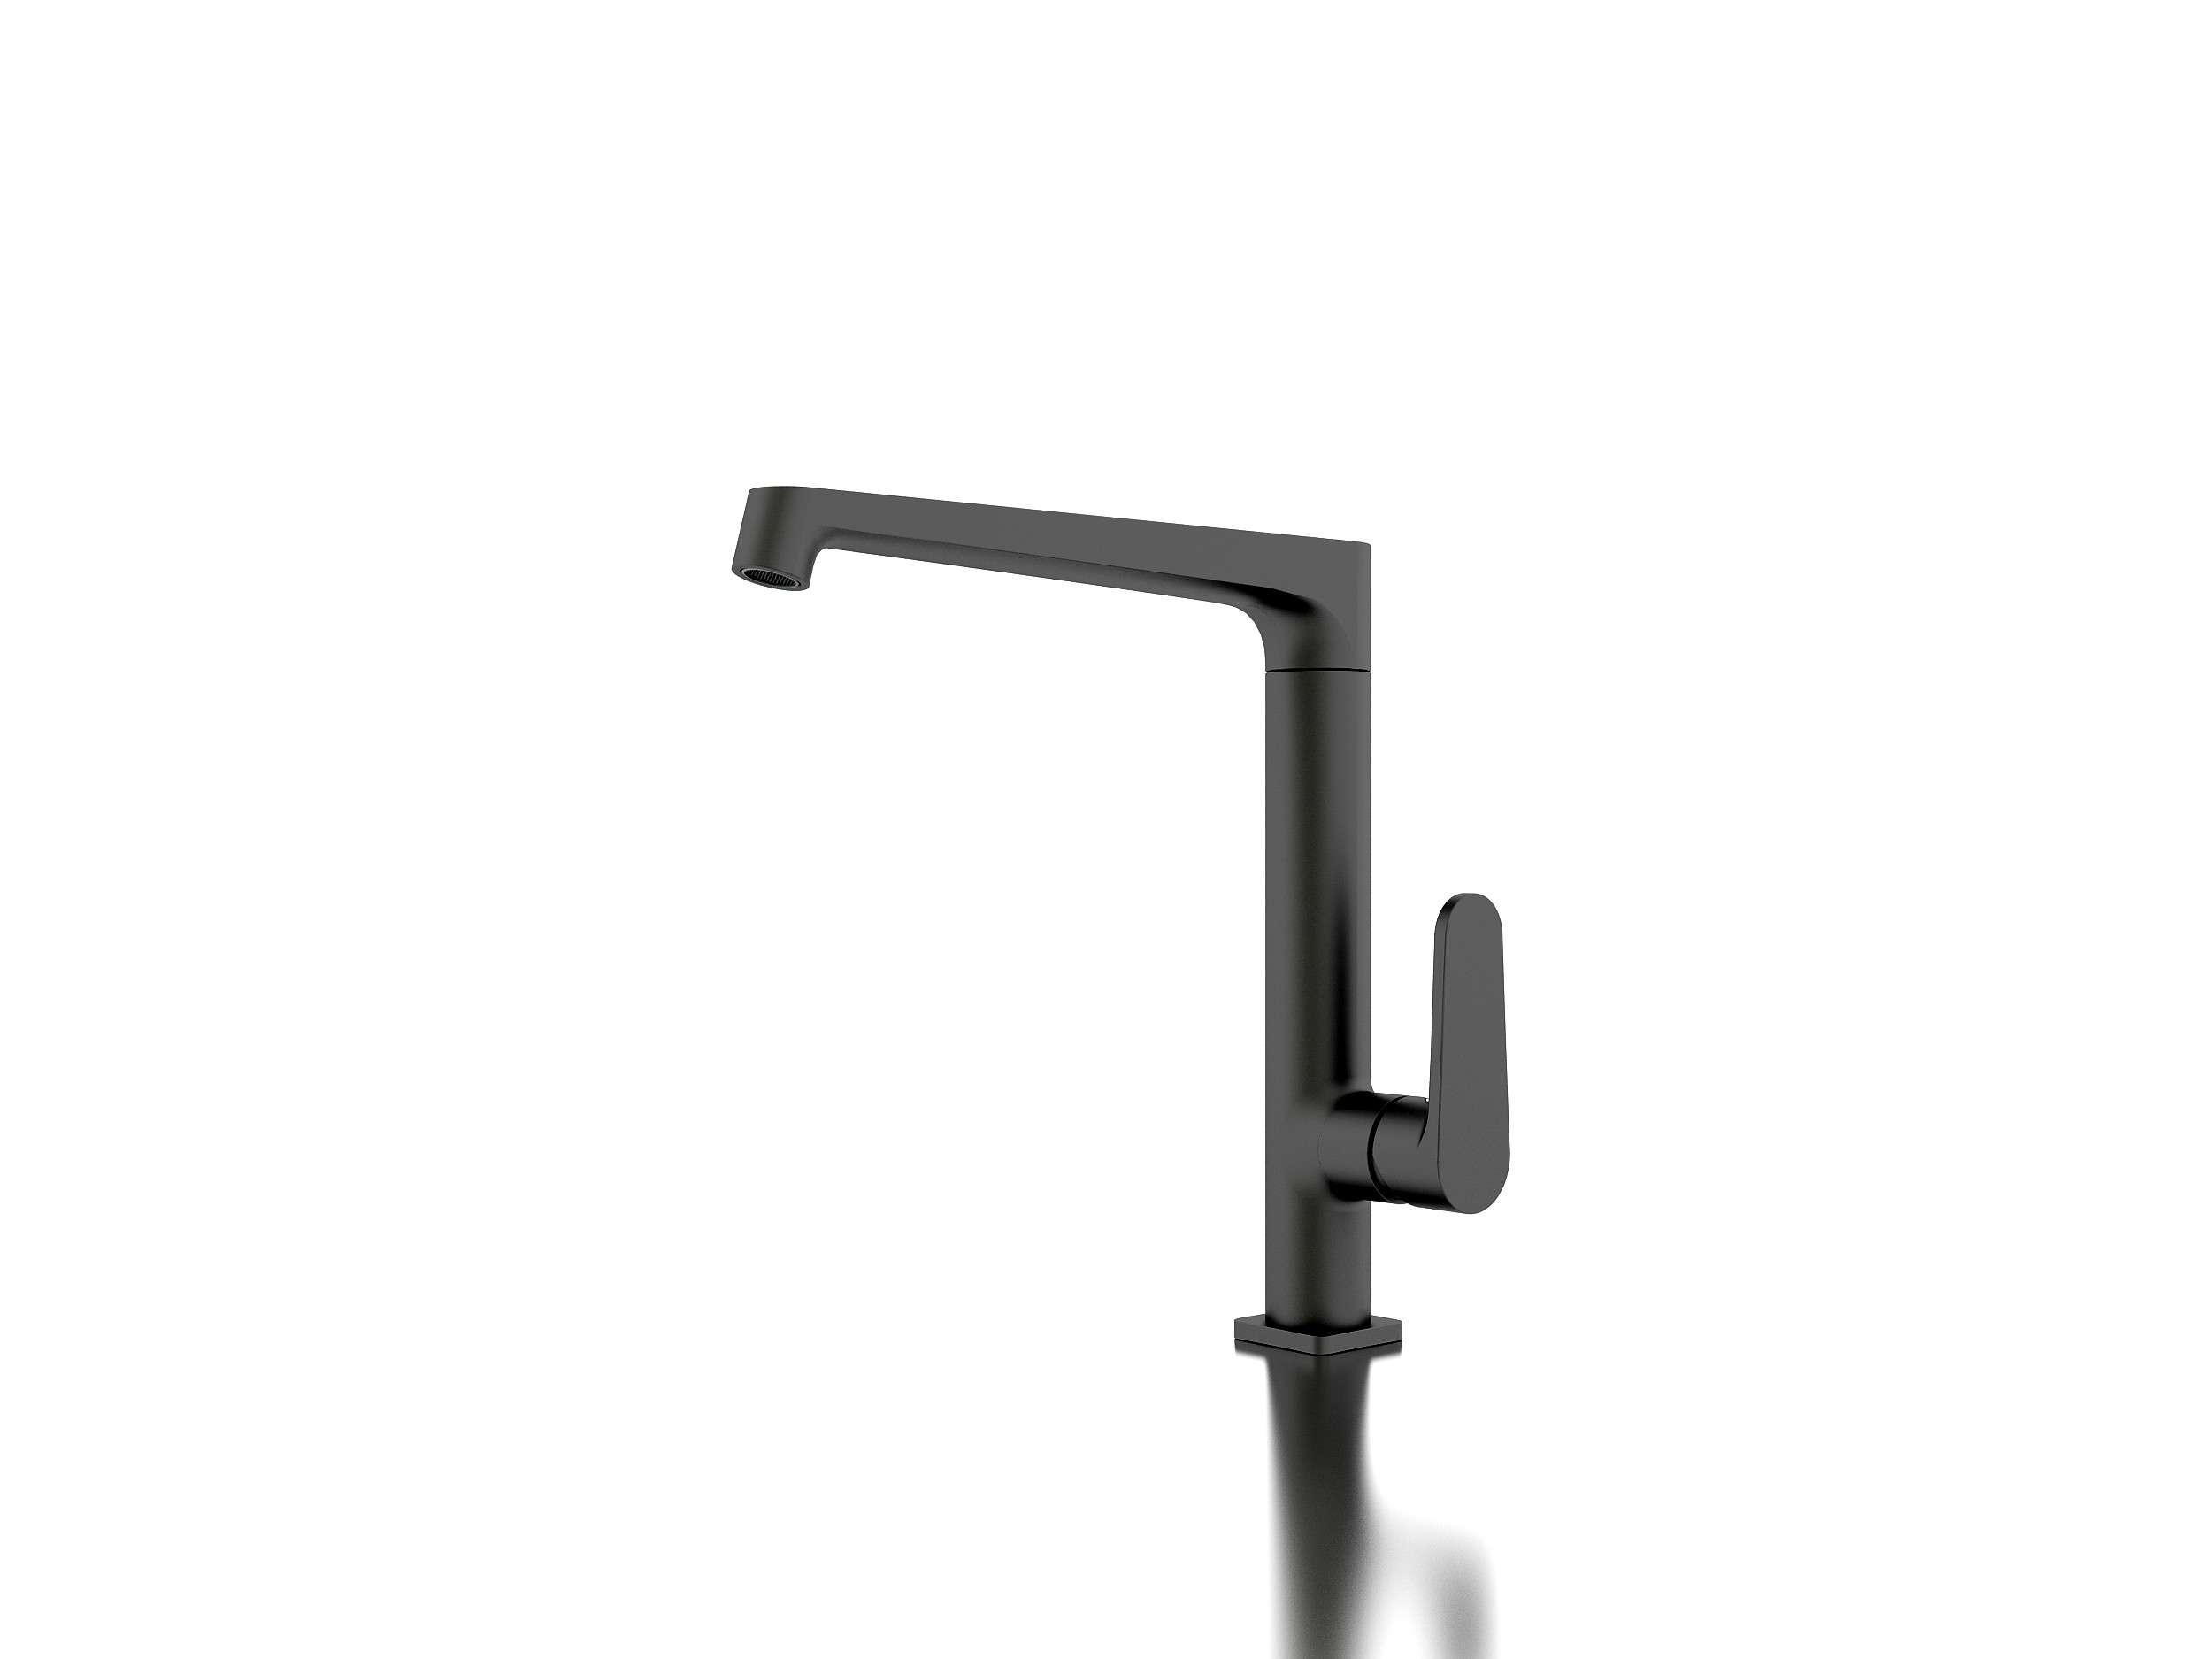 Details Victor Matt Black Designer Kitchen Mixer Tap Taps Faucet